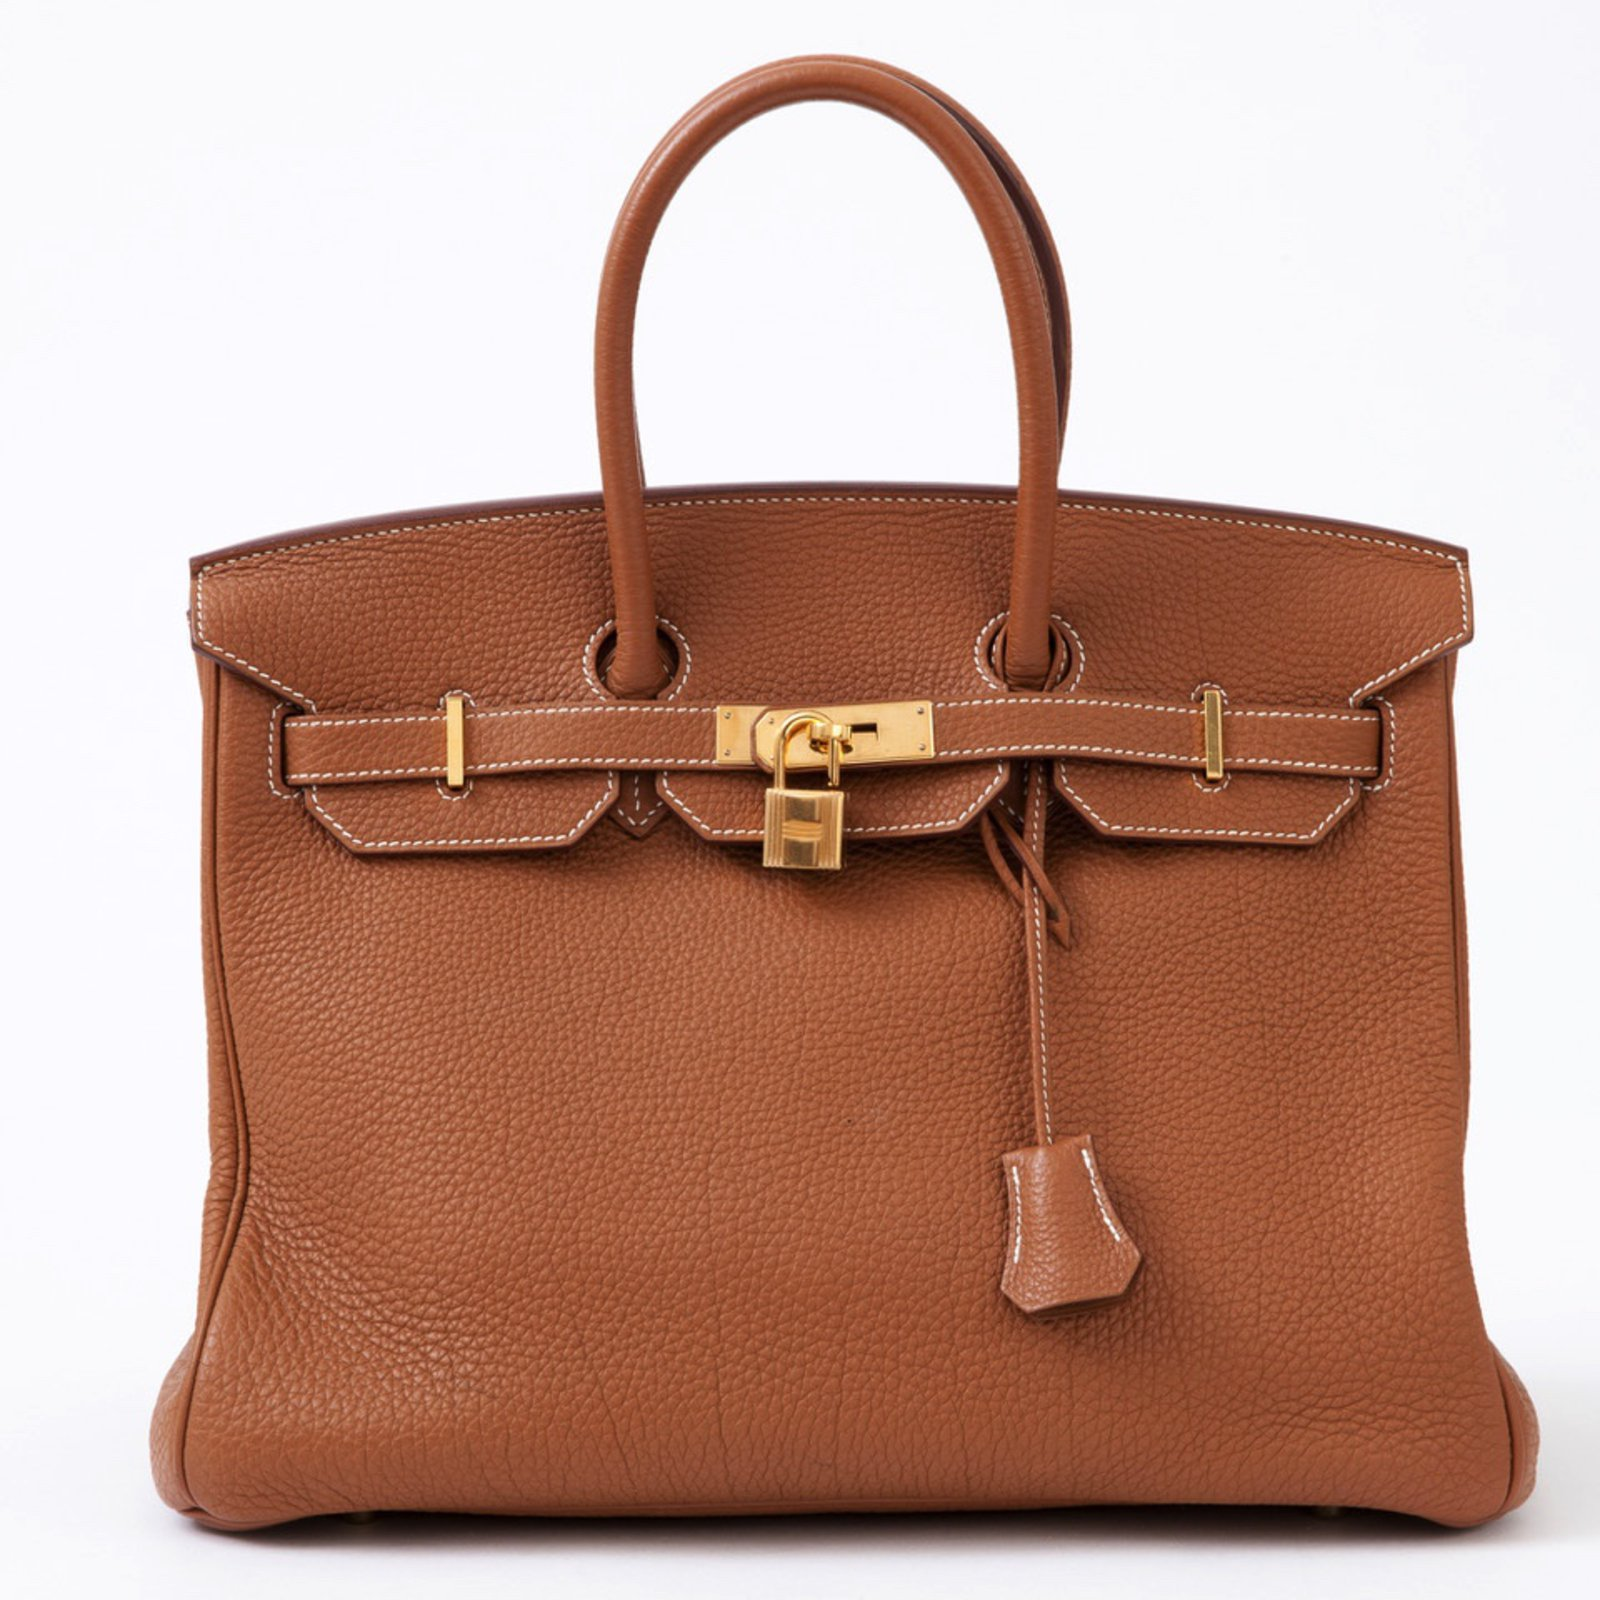 Sacs à main Hermès Splendide Sac Hermès Birkin 35 en cuir Togo Gold en très  bon 199826b5e00